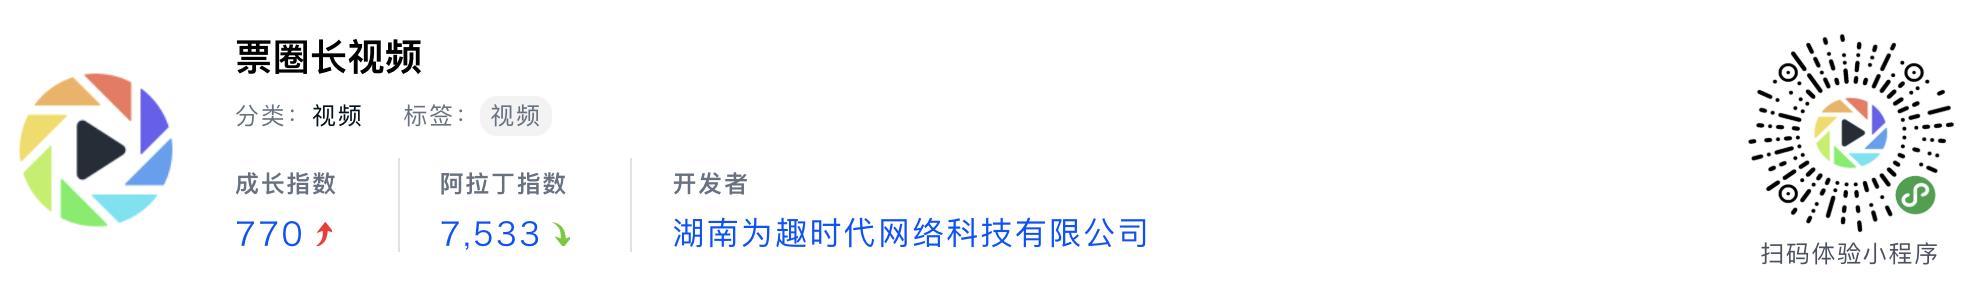 WeChatミニプログラム最新ランキングTOP20【2019年6月版】8位:票圈长视频